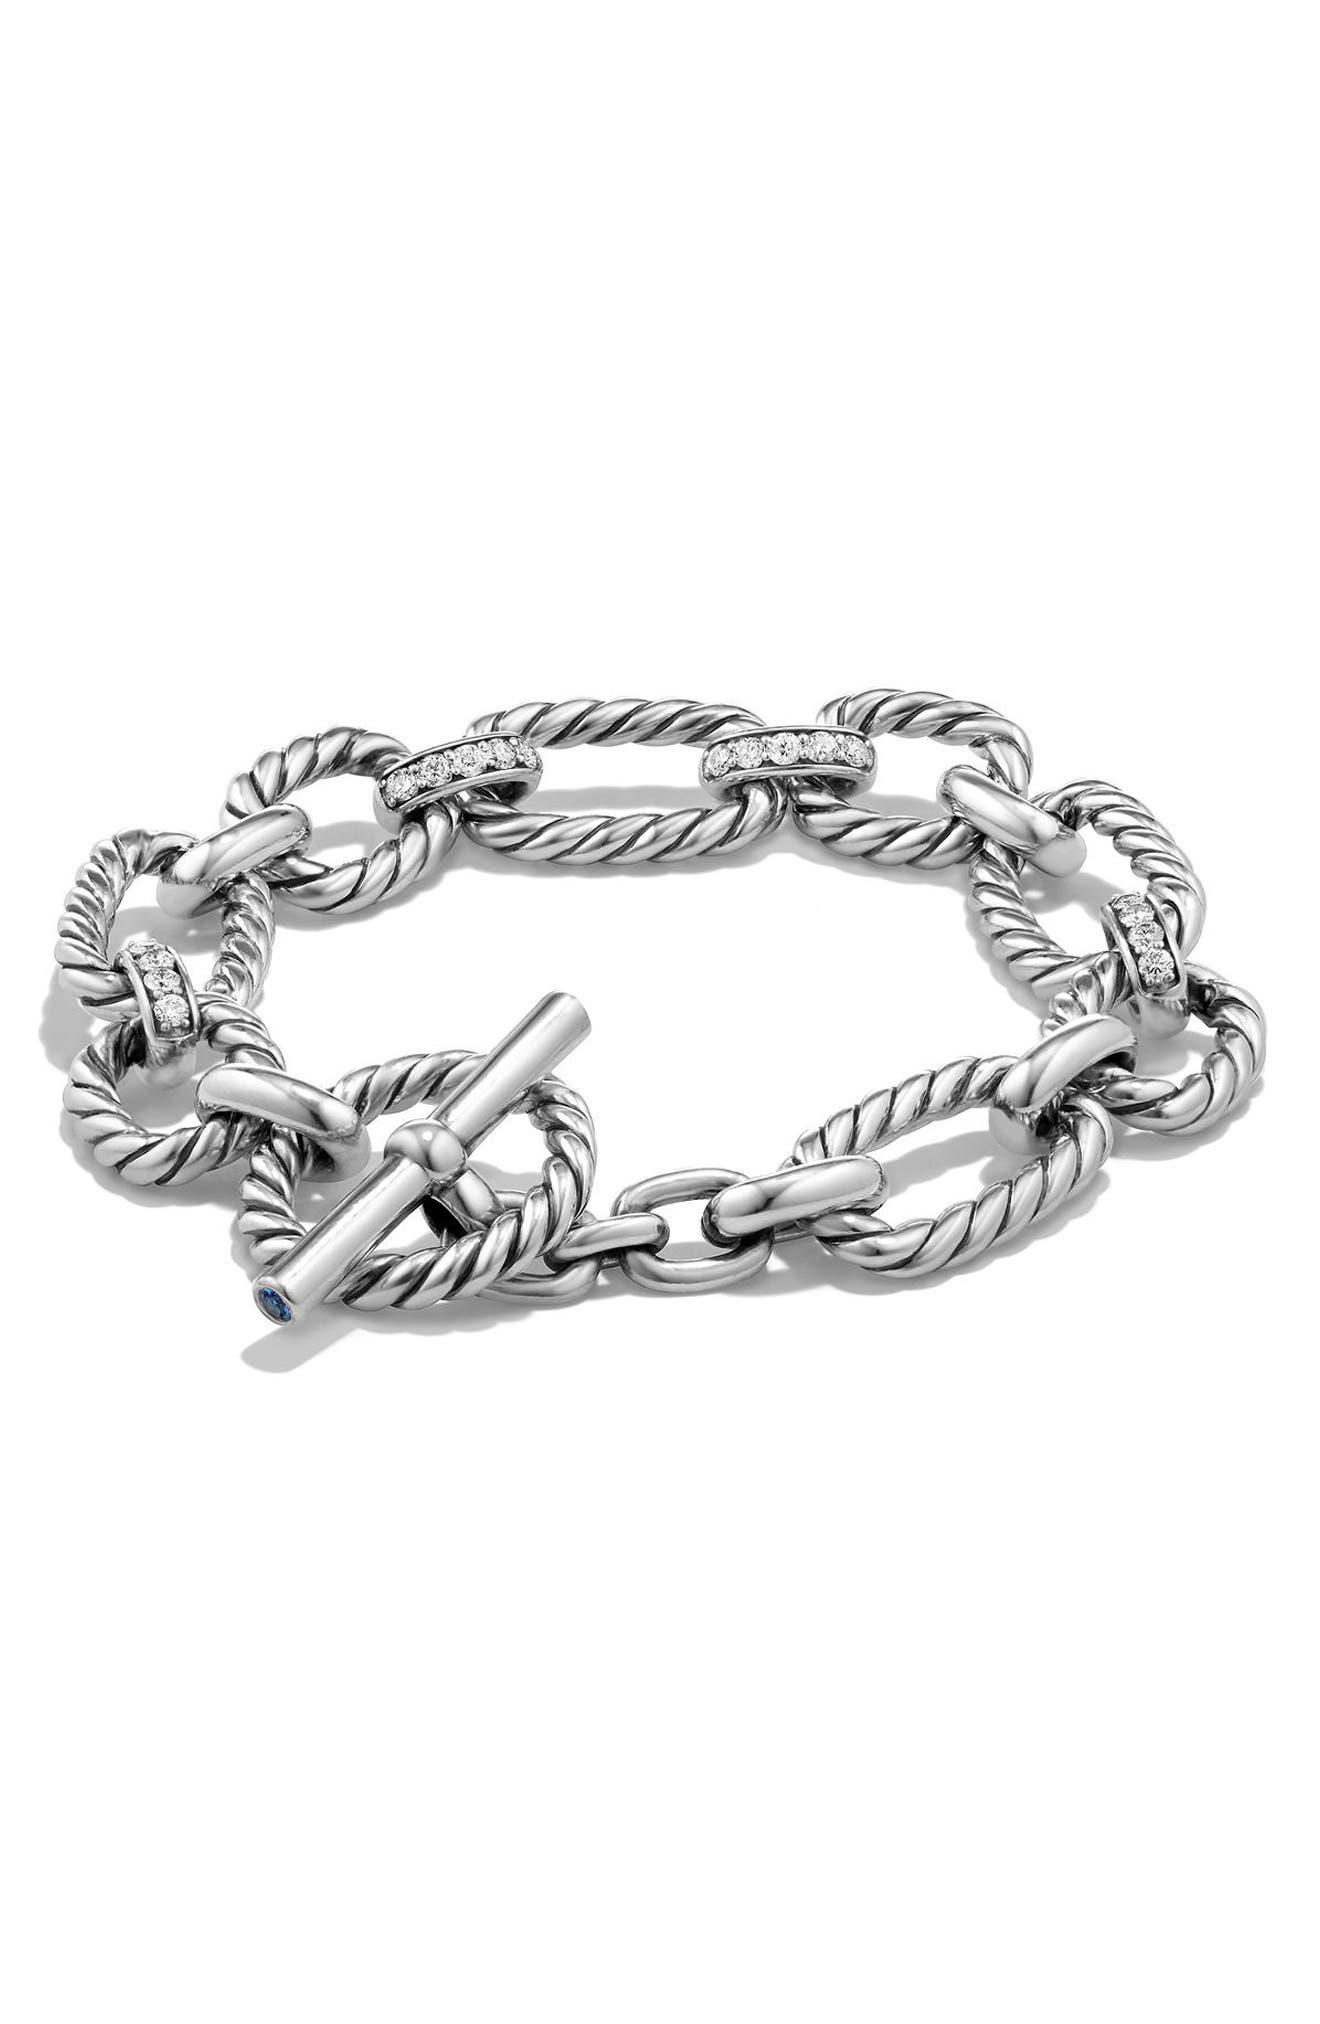 DAVID YURMAN Chain Cushion Link Bracelet with Diamonds